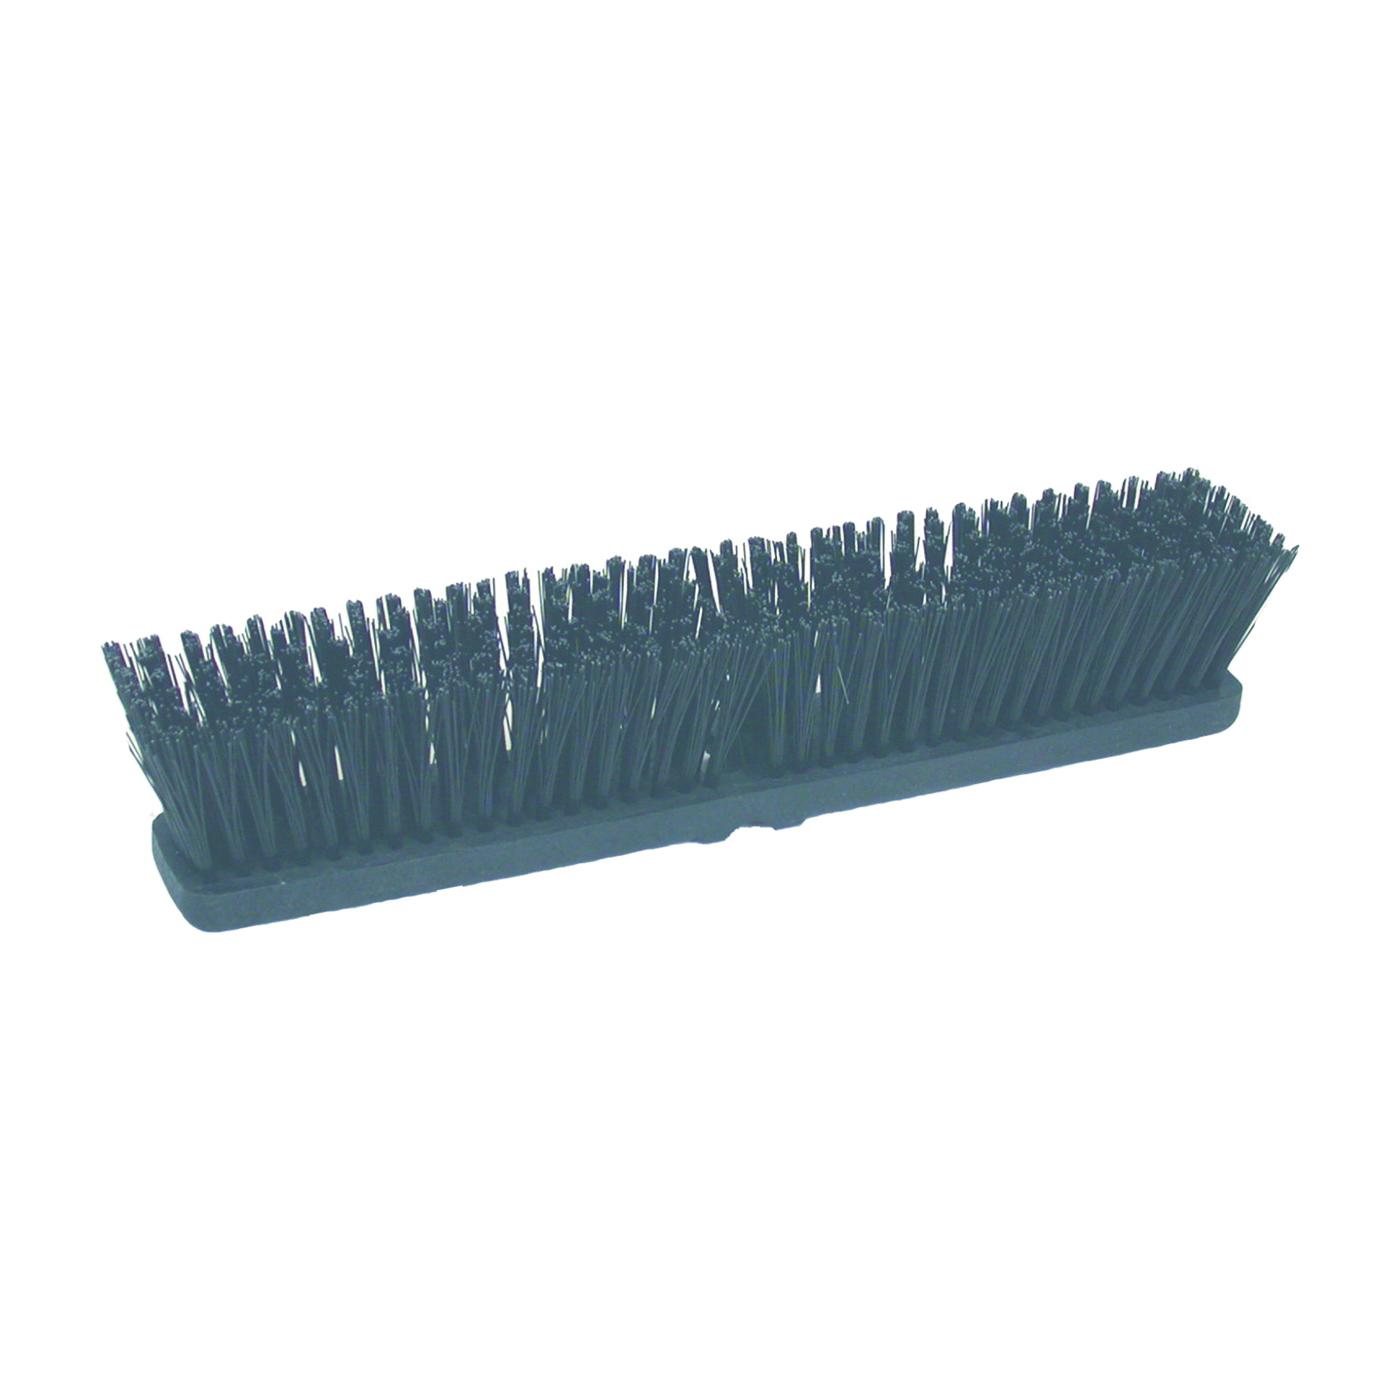 Picture of BIRDWELL 2021-12 Broom Head Threaded, Threaded, 3 in L Trim, Polystyrene Bristle, Black